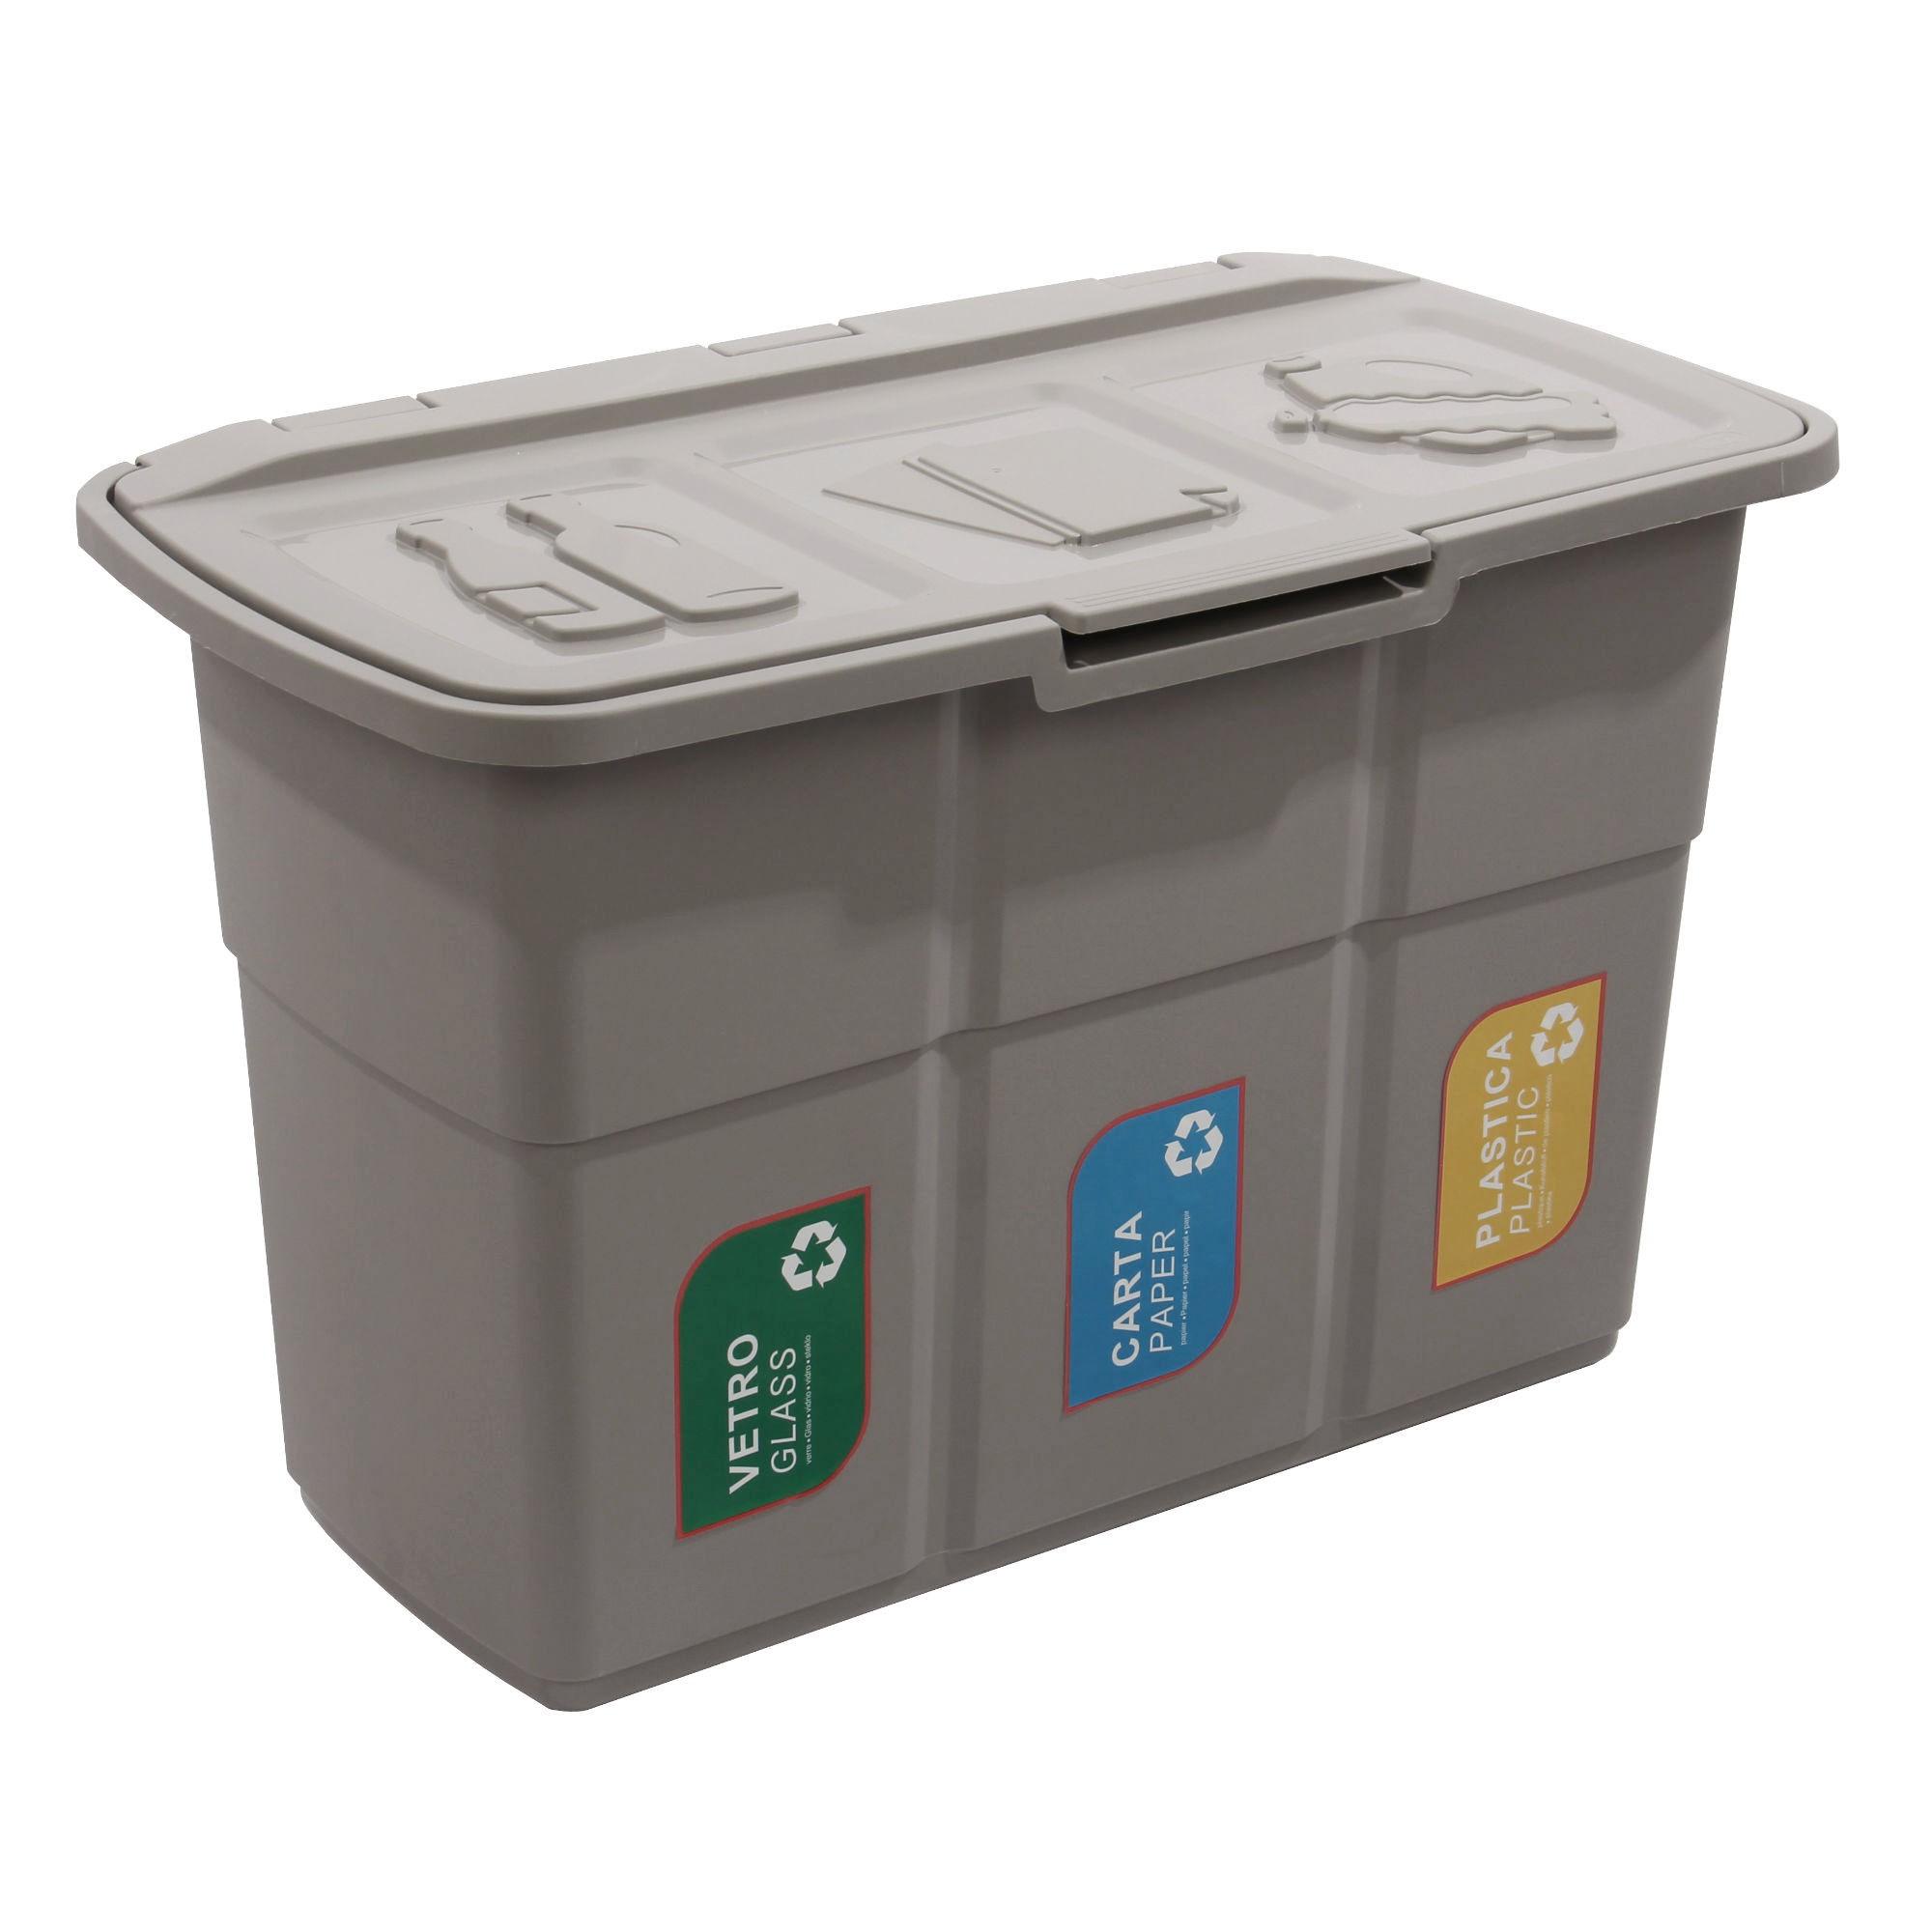 Cos Gunoi Colectare Selectiva Plastina Ecopat 83003 Din Plastic Forma Dreptunghiulara Diverse Culori Cu Capac 3 X 25l